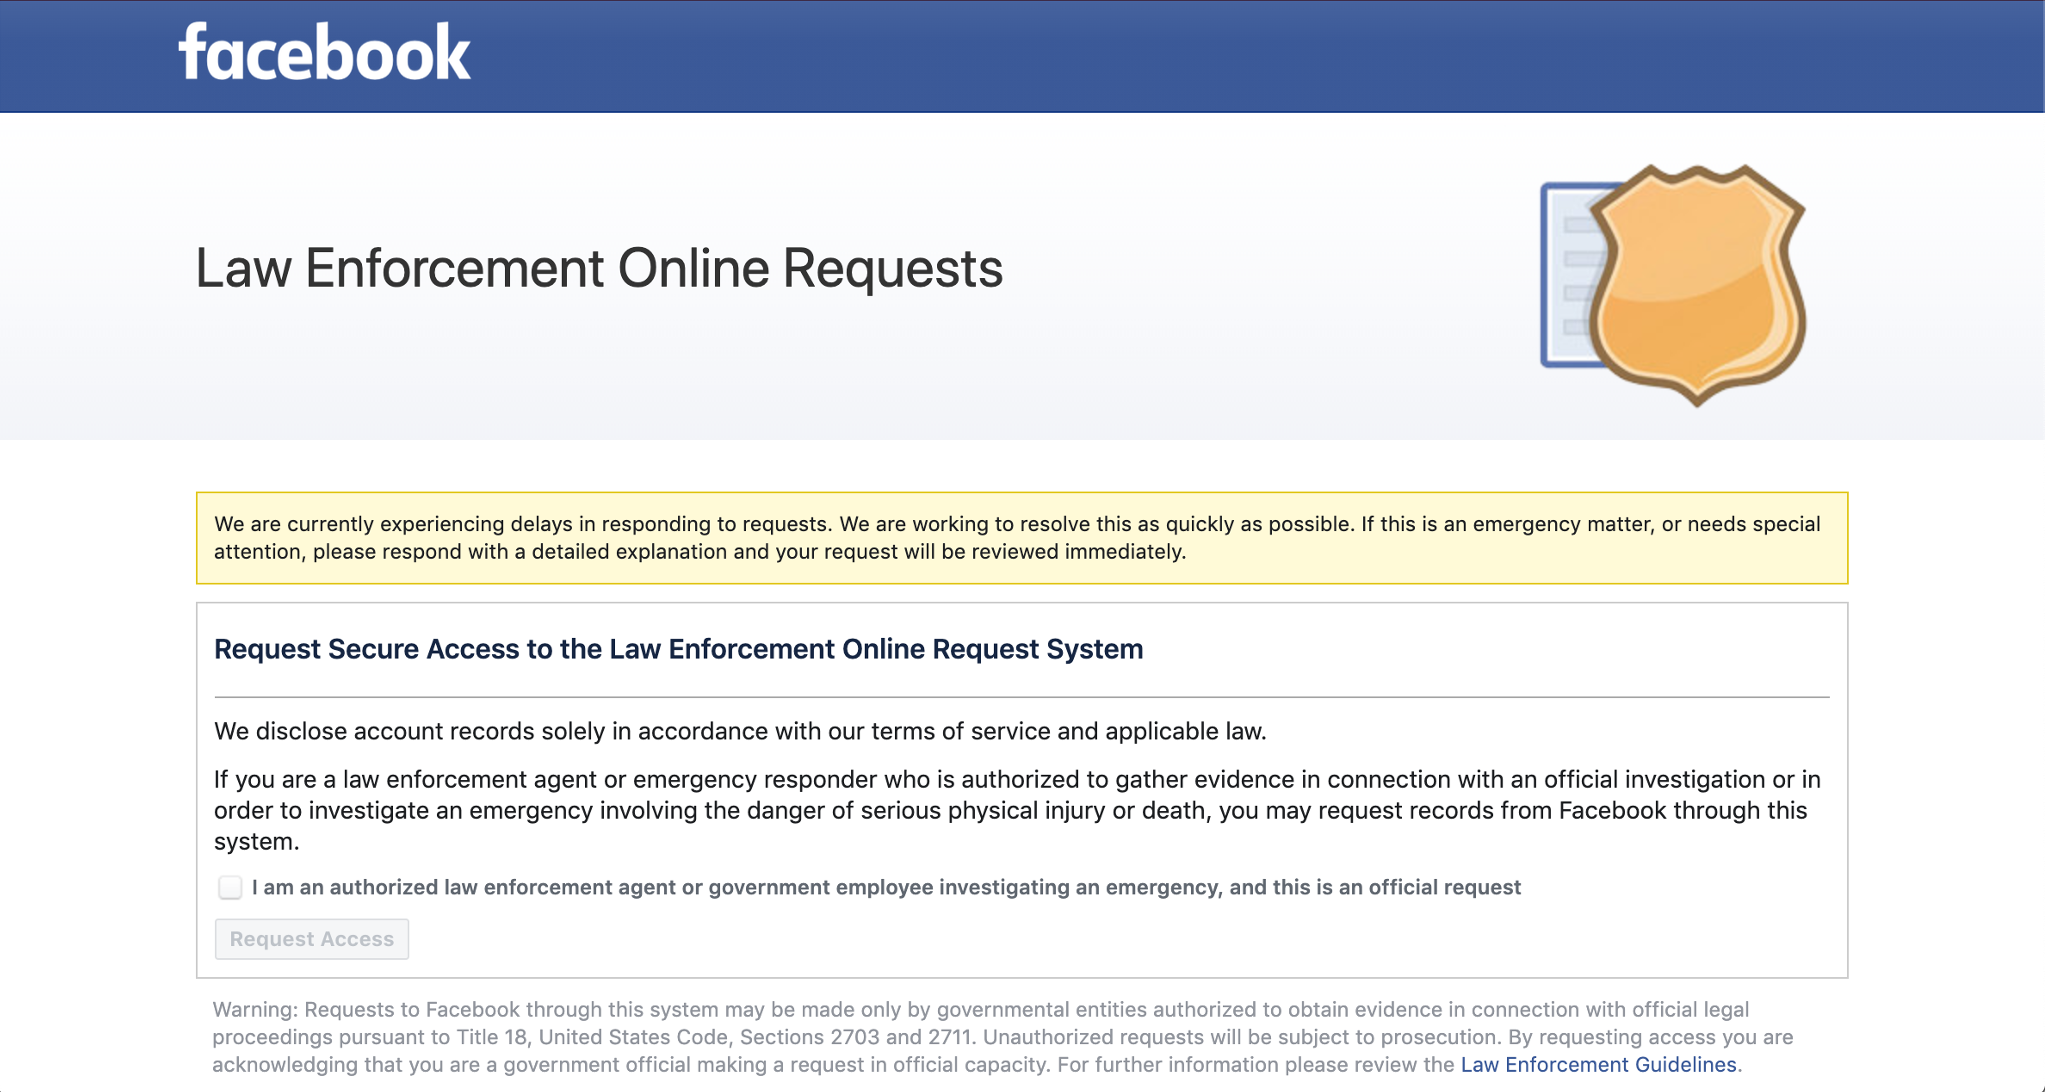 A screenshot of Facebook's law enforcement data request portal